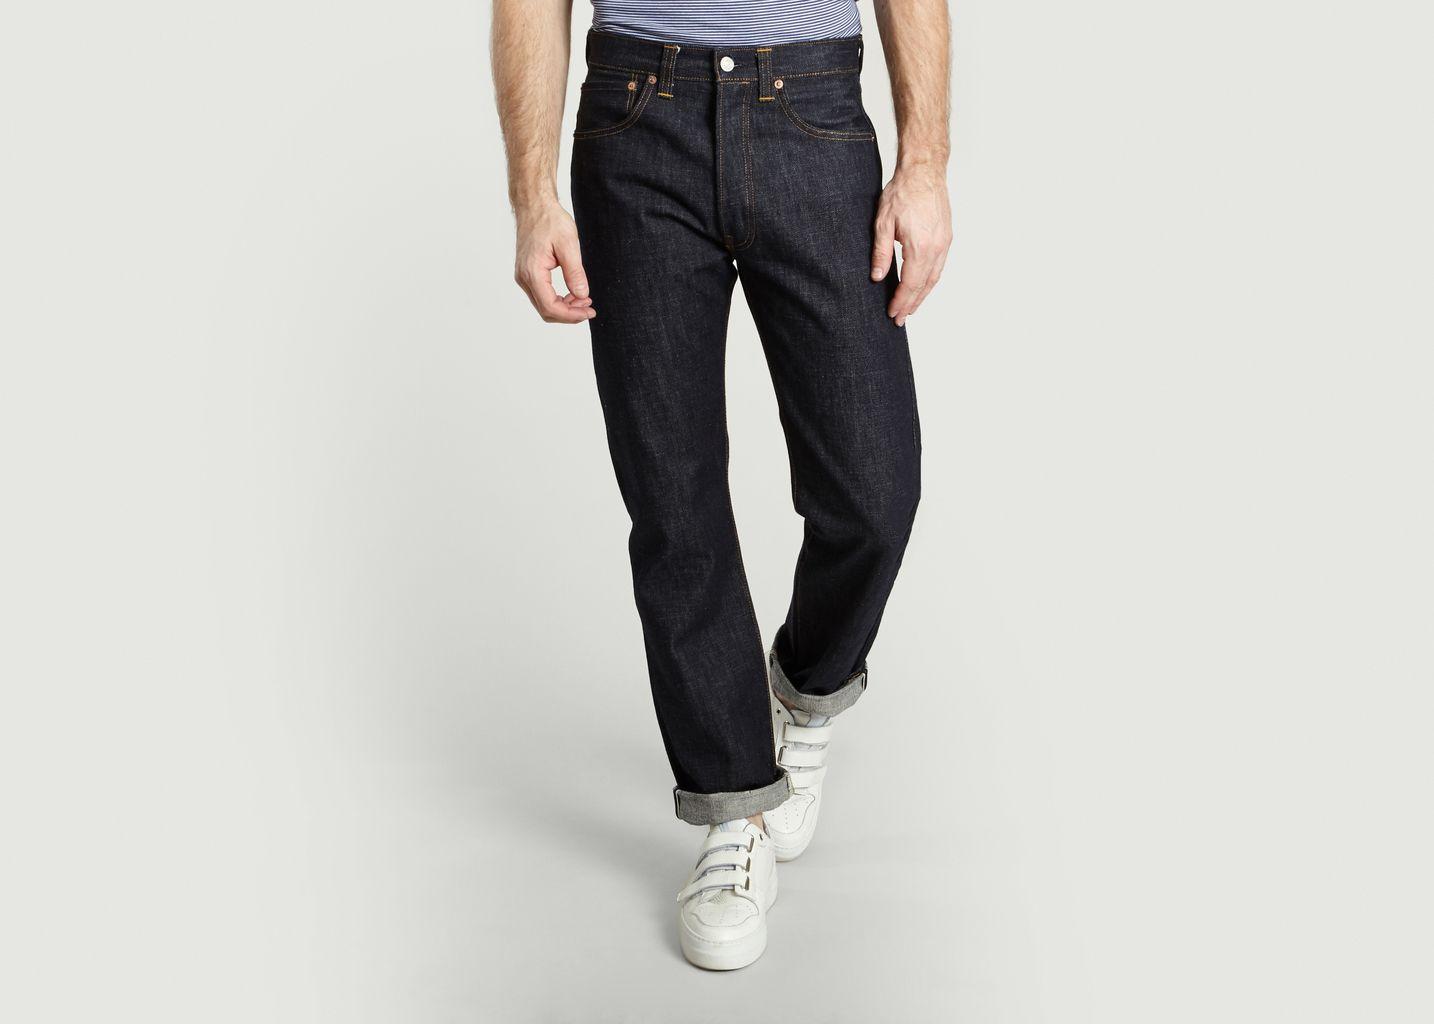 775060bdef7 111786456955-06RW-levis-vintage-clothing-1947501jeansrigid-01.jpg